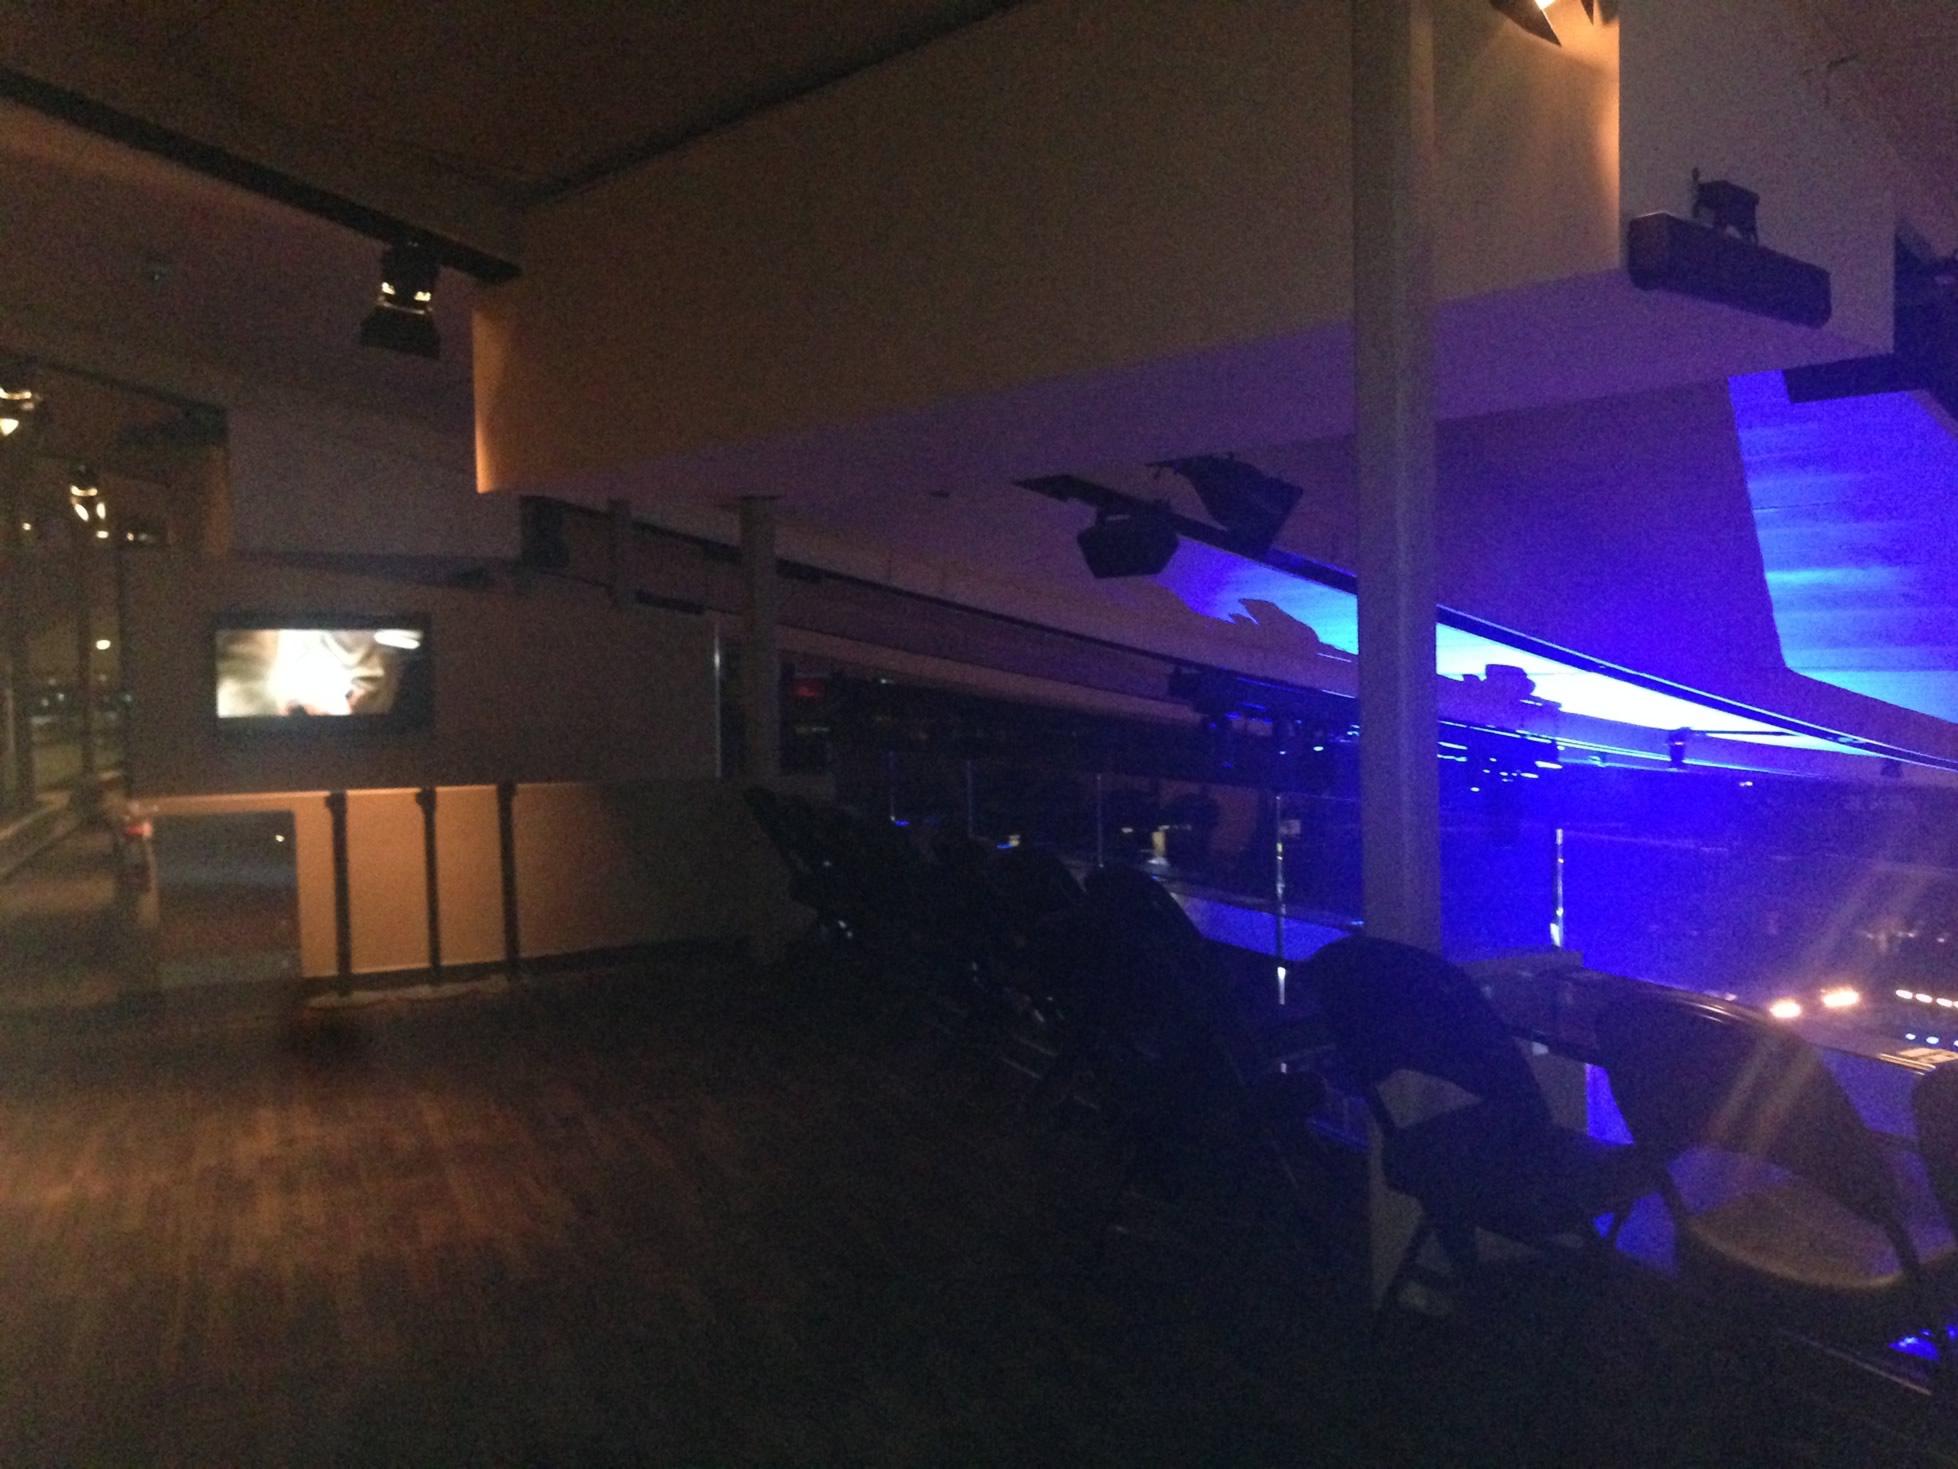 Madison Square Garden Chase Bridges Concert Seating  : madisonsquaregarden chasebridges 20160628227 from www.rateyourseats.com size 1958 x 1469 jpeg 361kB